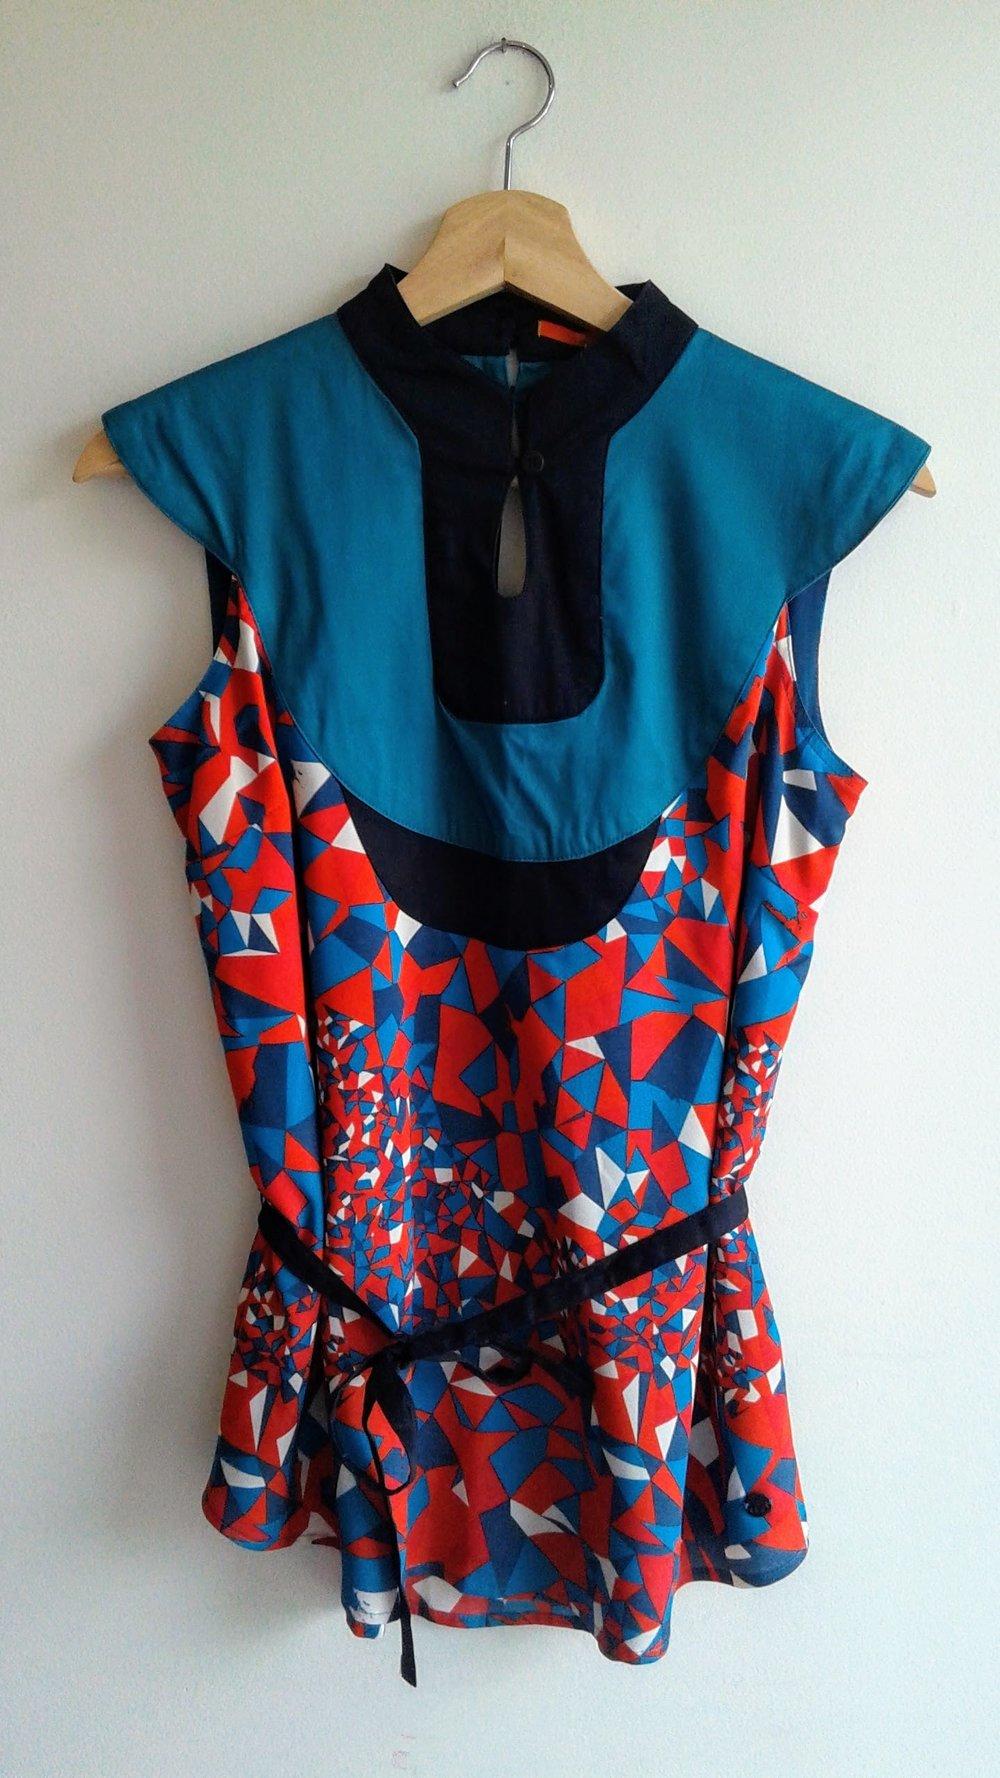 Skunkfunk top; Size S, $24